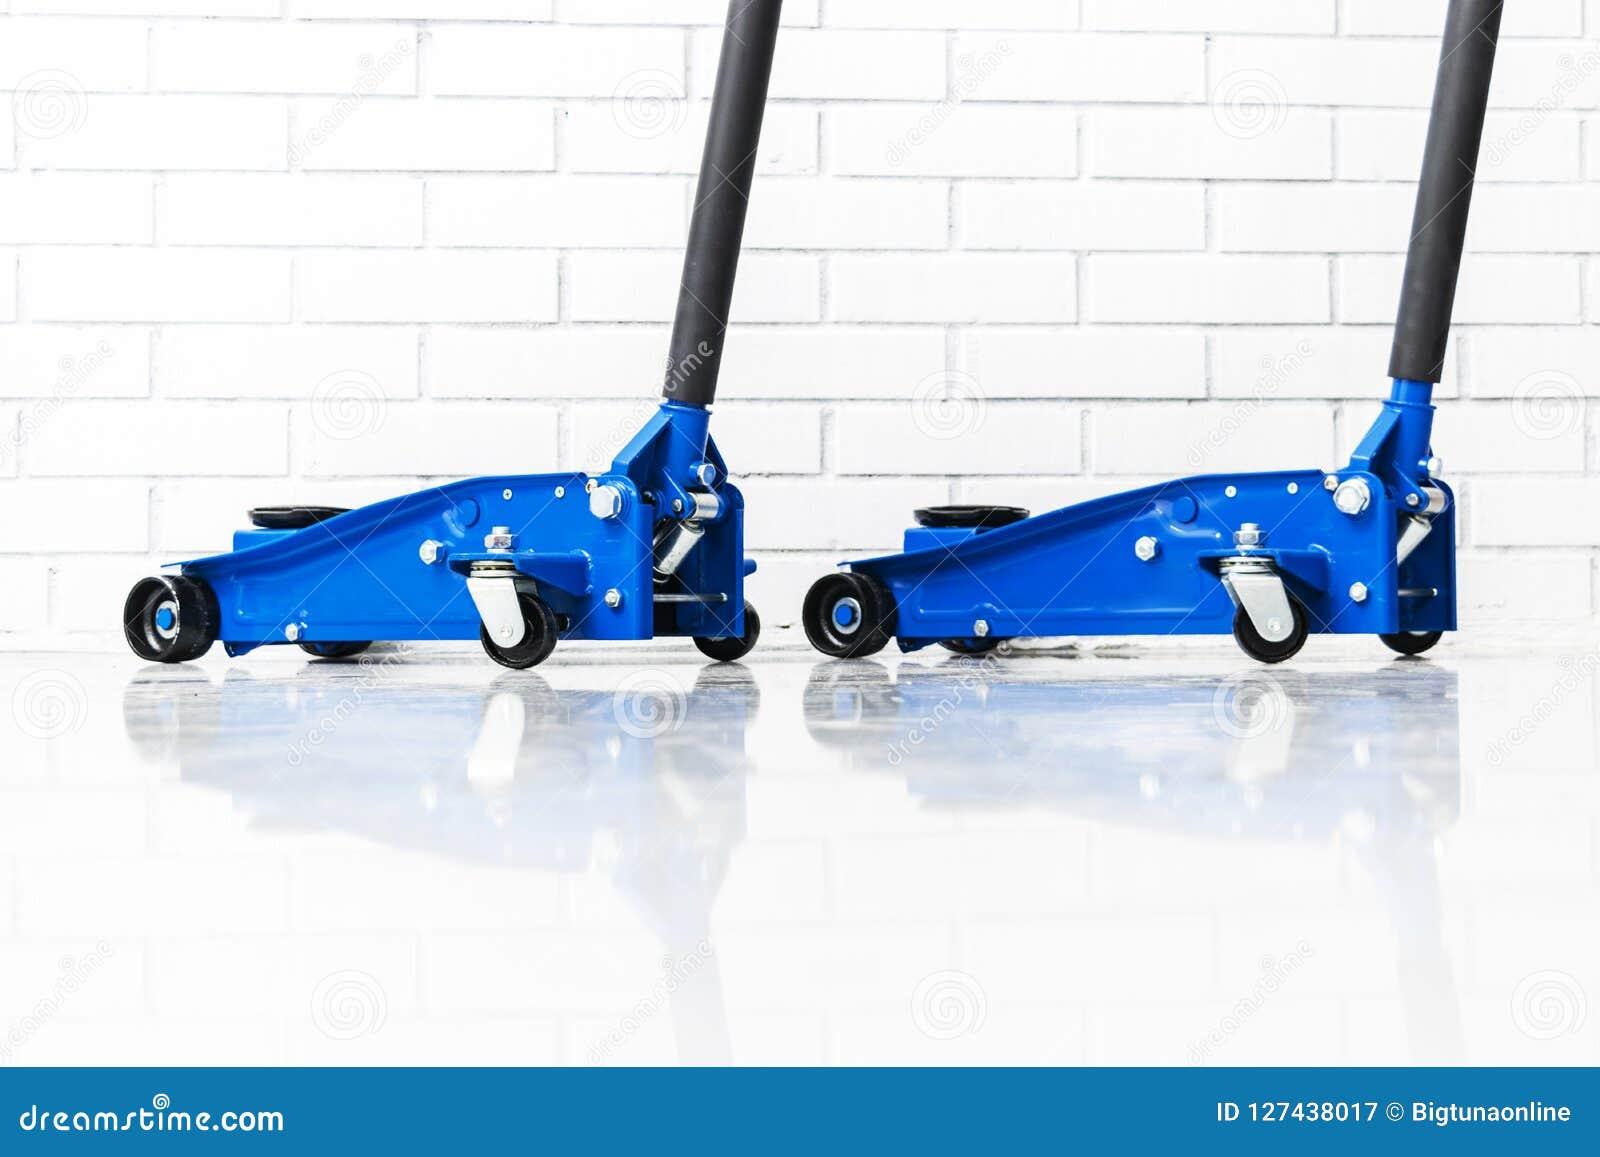 Hydraulic car floor jacks. Car Lift. Blue Hydraulic Floor Jack For car Repairing. Extra safety measures